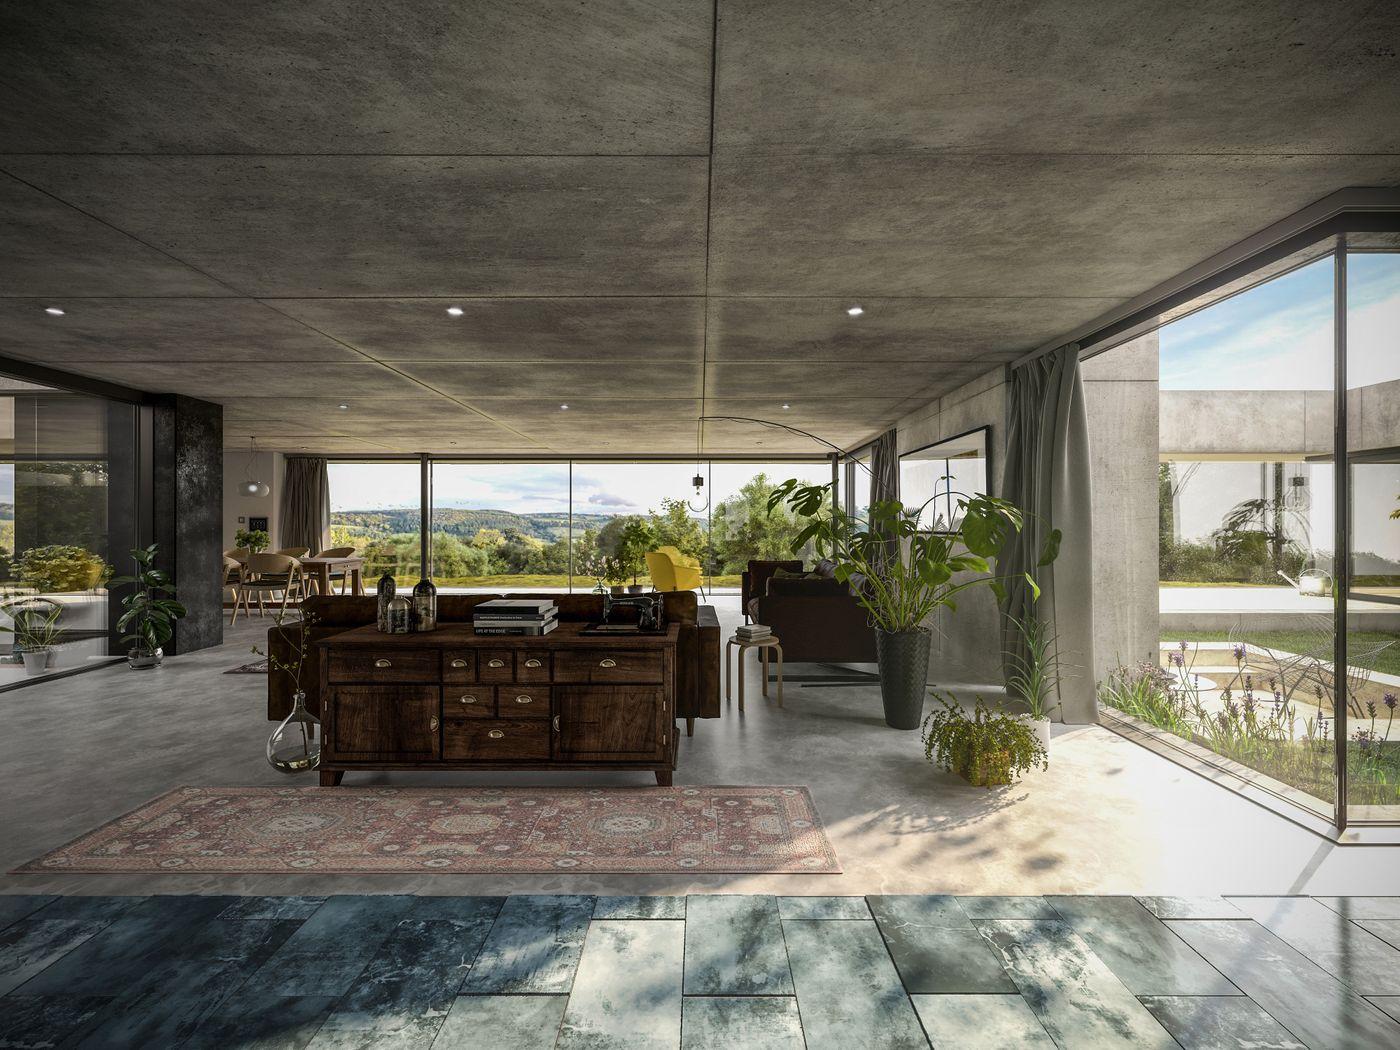 Ar849 Lancaster Bartle What%20is Interior Living Room Adamlancaster